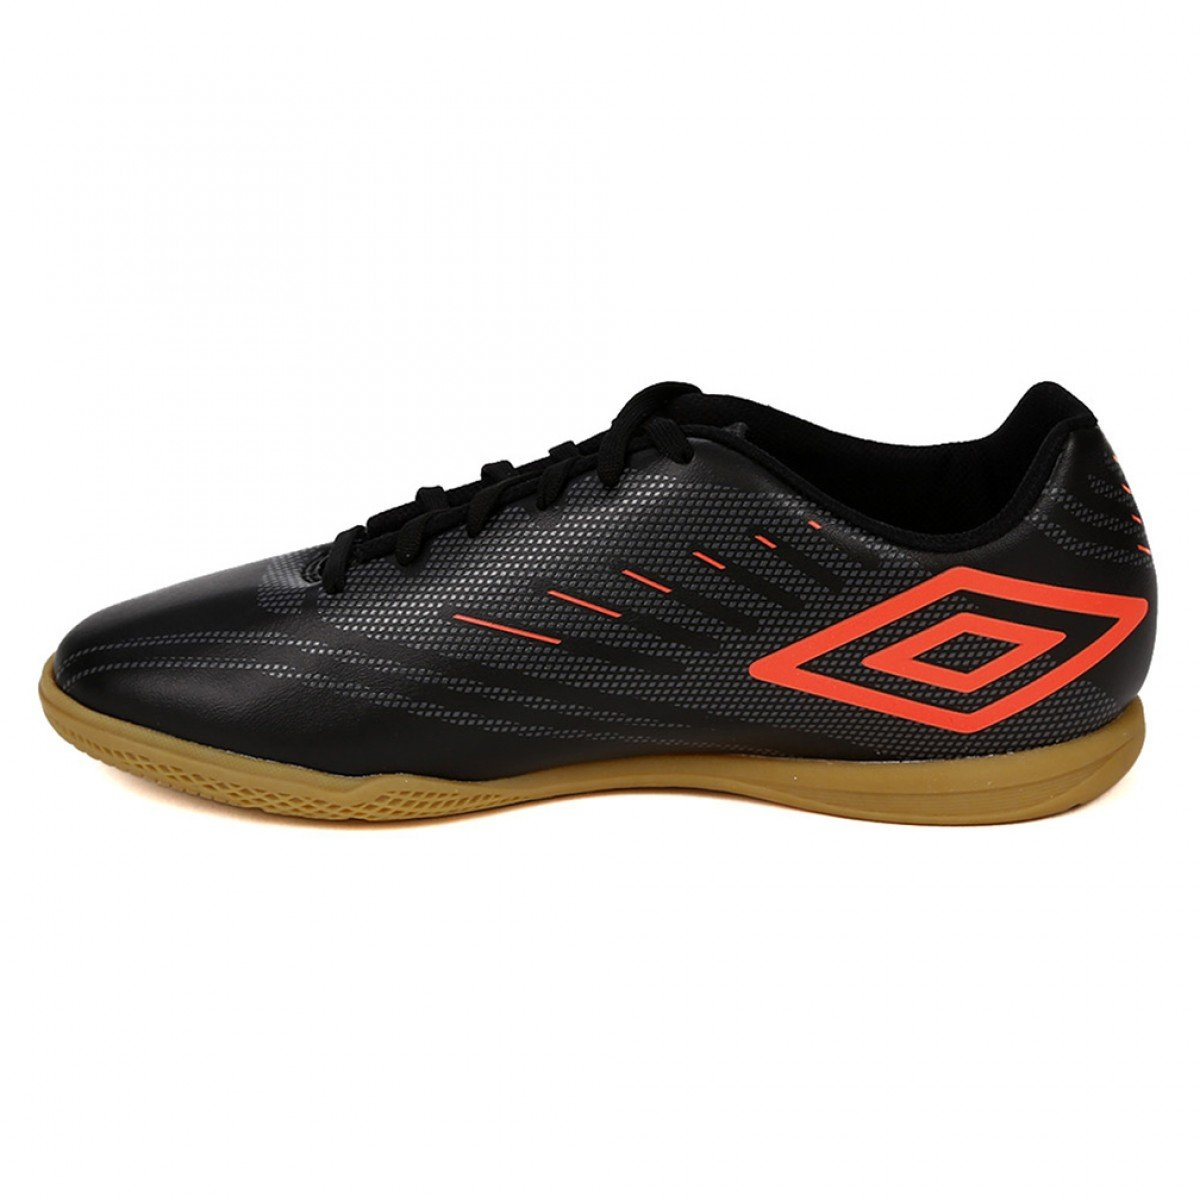 fa41a8de4e Chuteira Futsal Umbro Speed IV Preto e Coral - Compre Agora